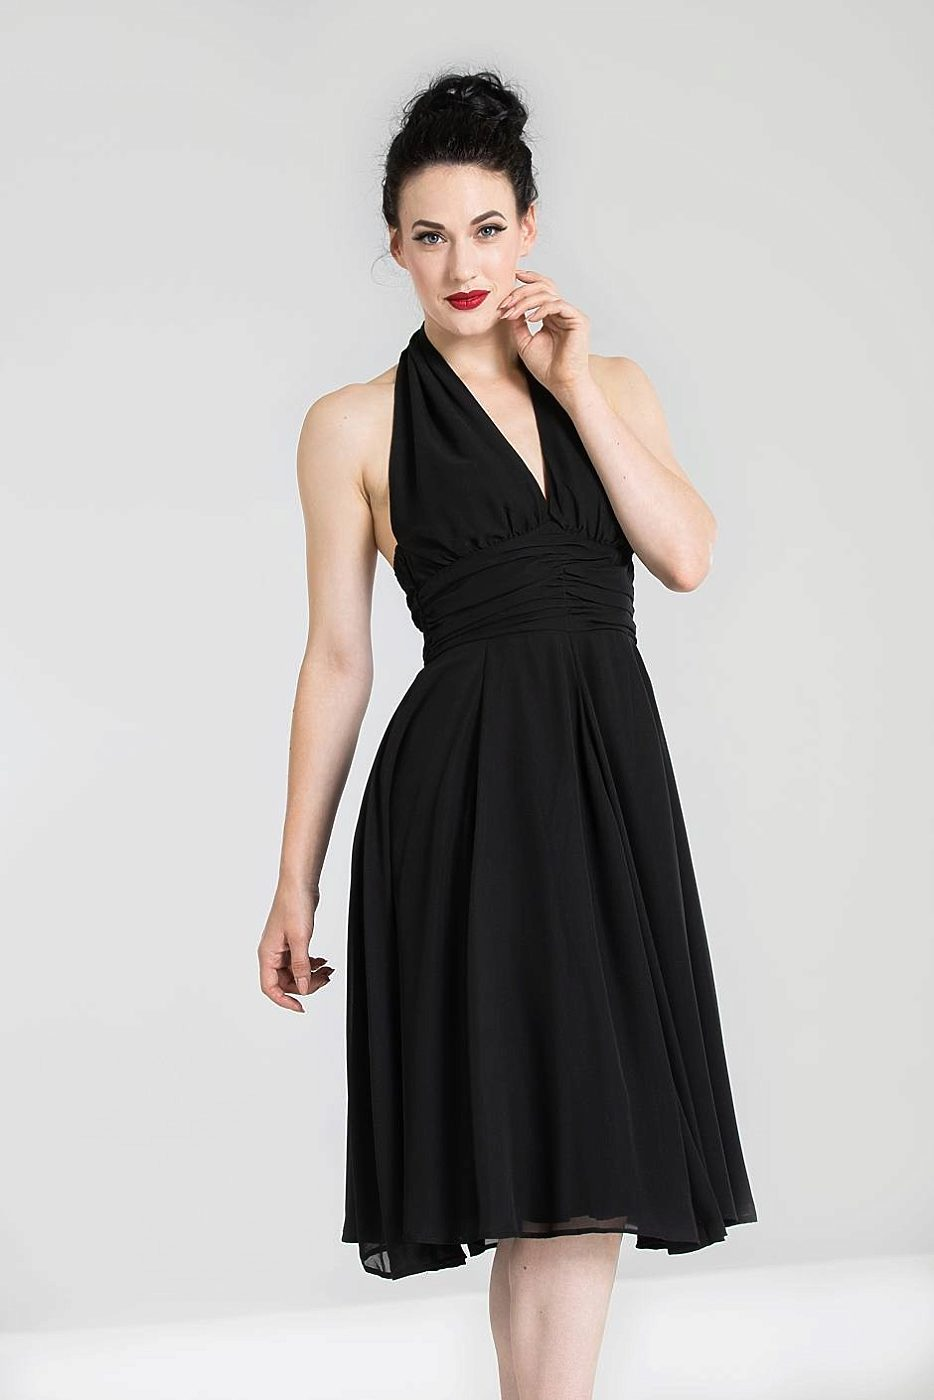 0d60f7610bf6 Černé šaty za krk Hell Bunny Monroe Hell Bunny